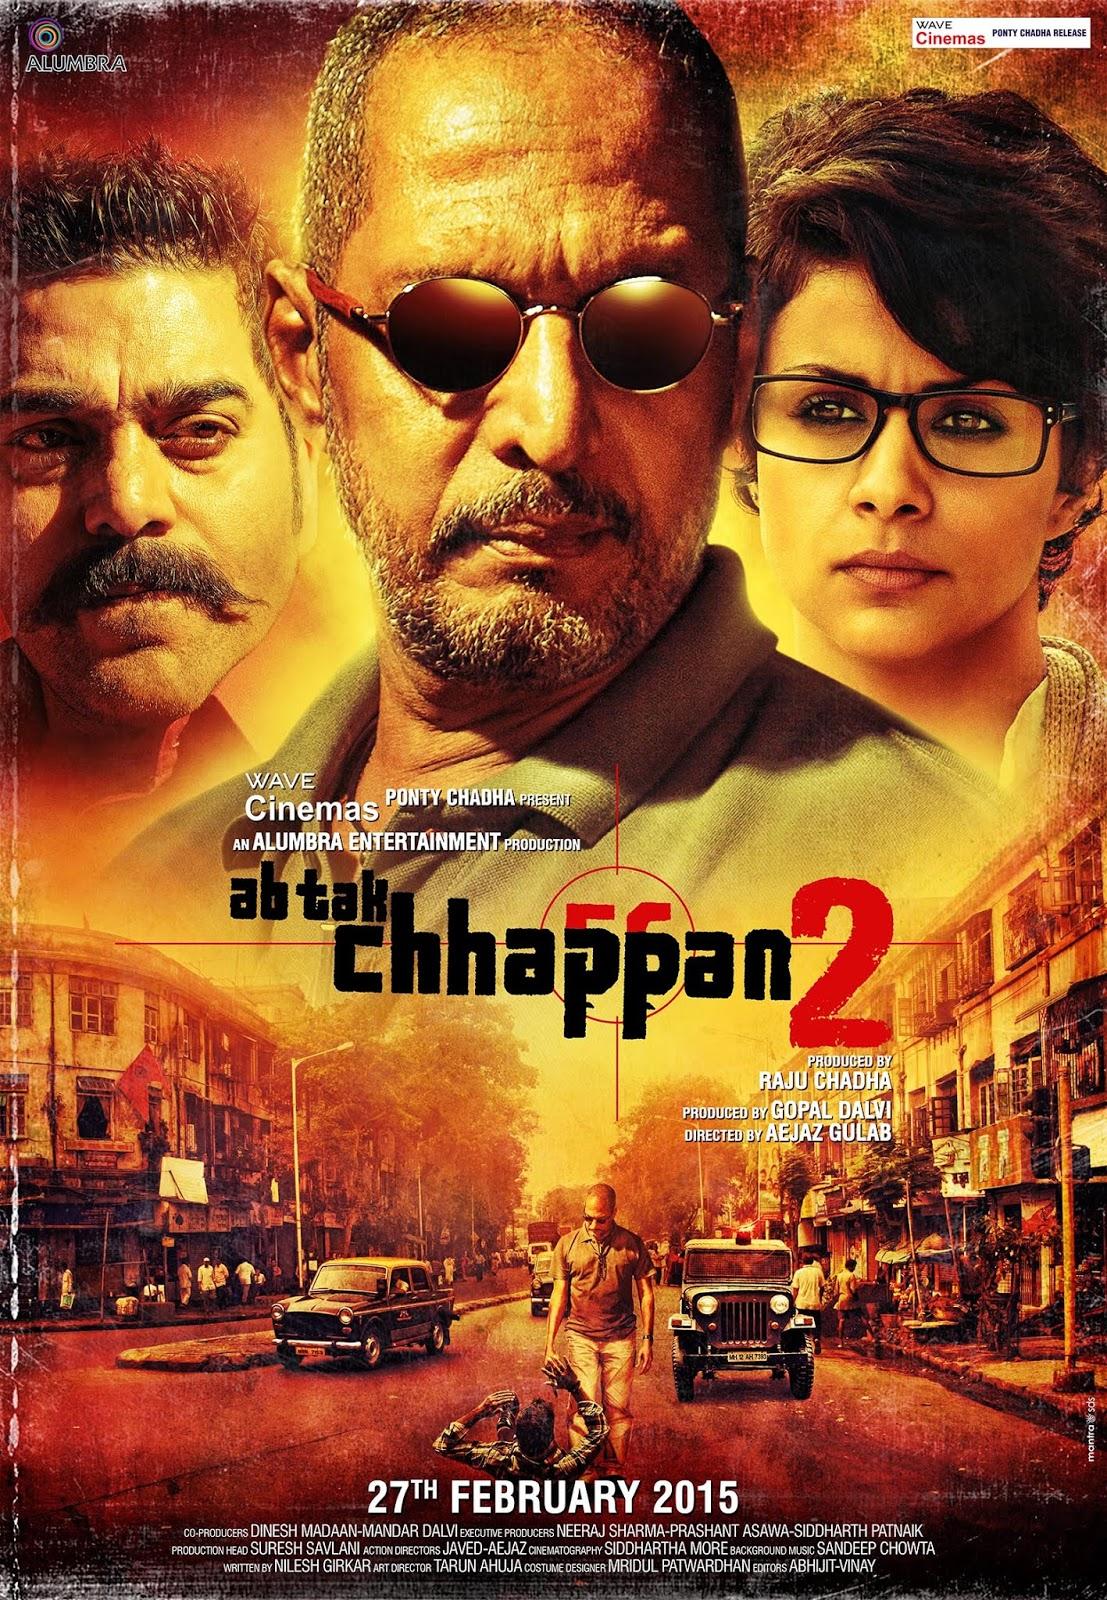 Ab Tak Chhappan 2. 2015 Hindi 720p HDRip Full Movie Free Download